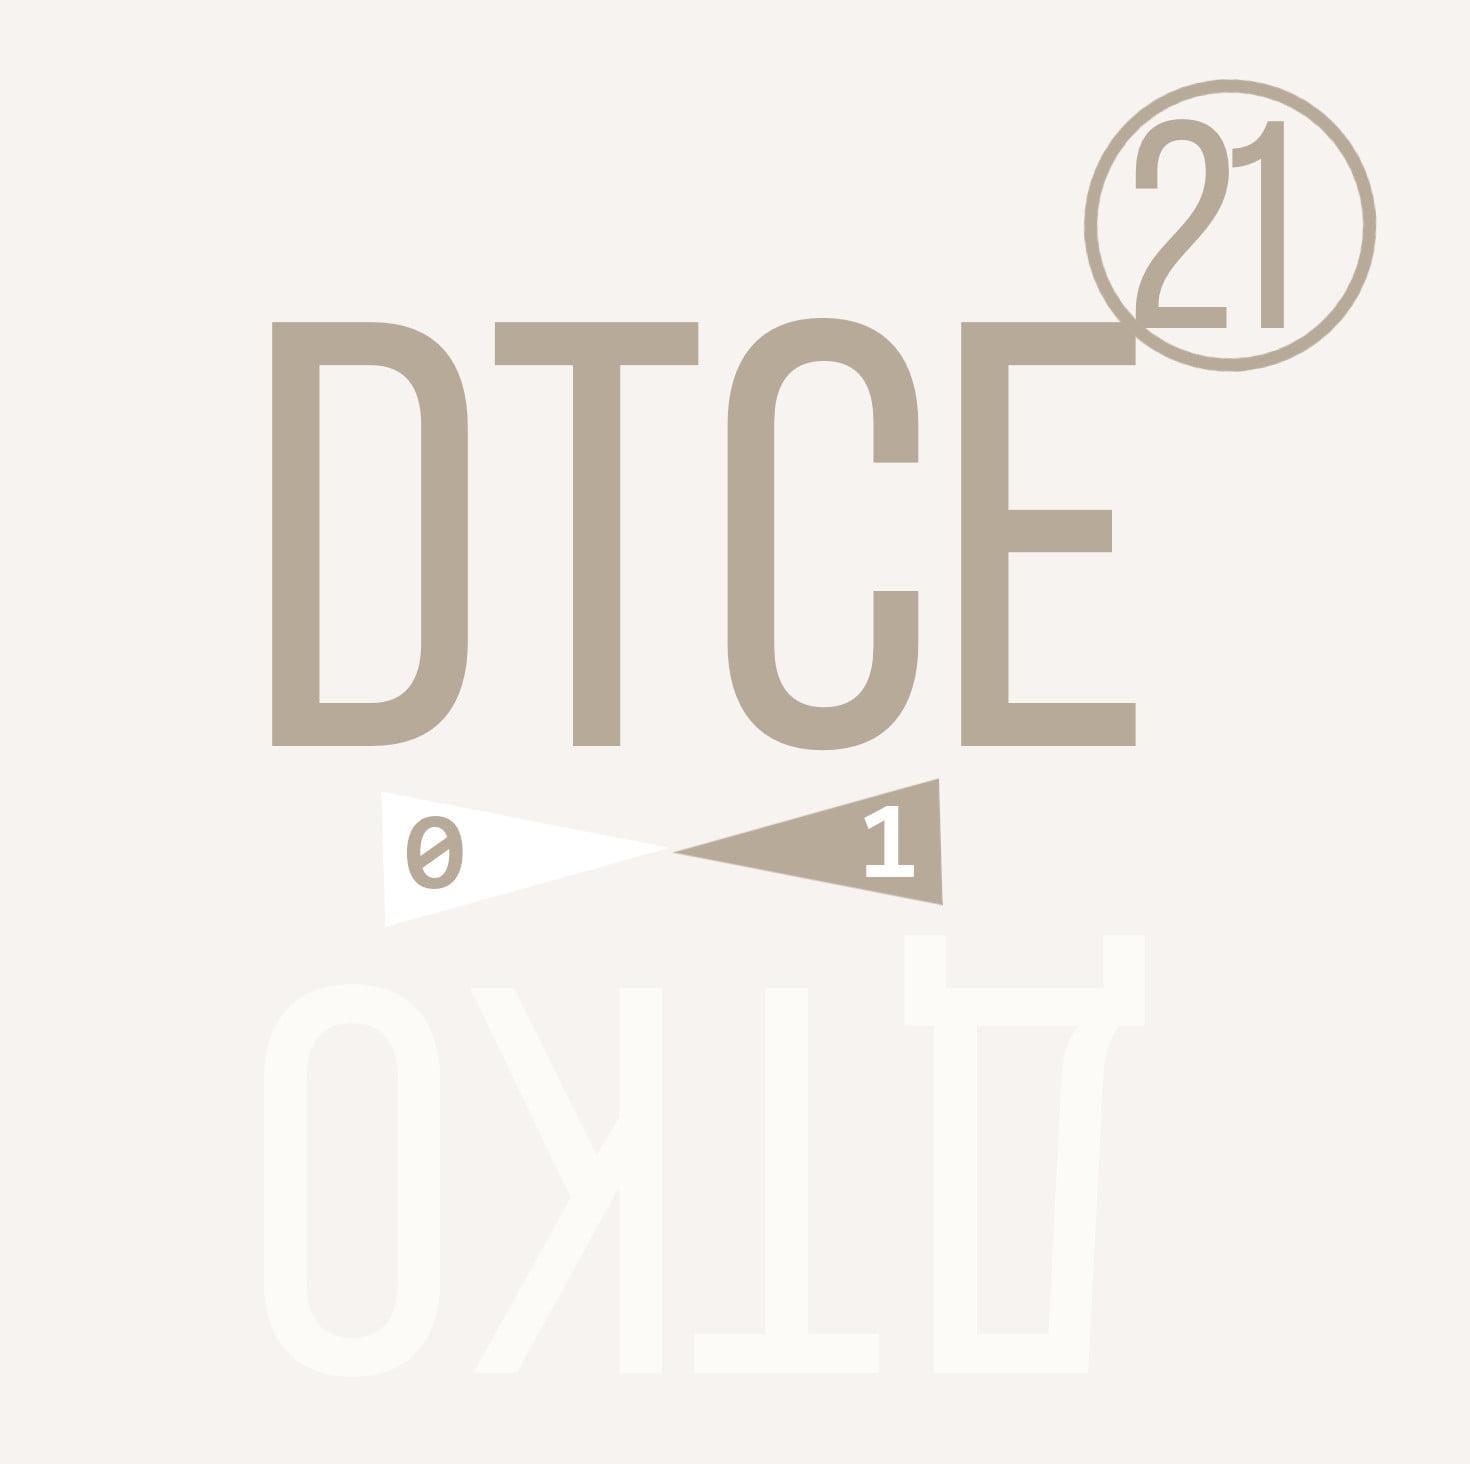 Prva međunarodna online konferencija DTCE21